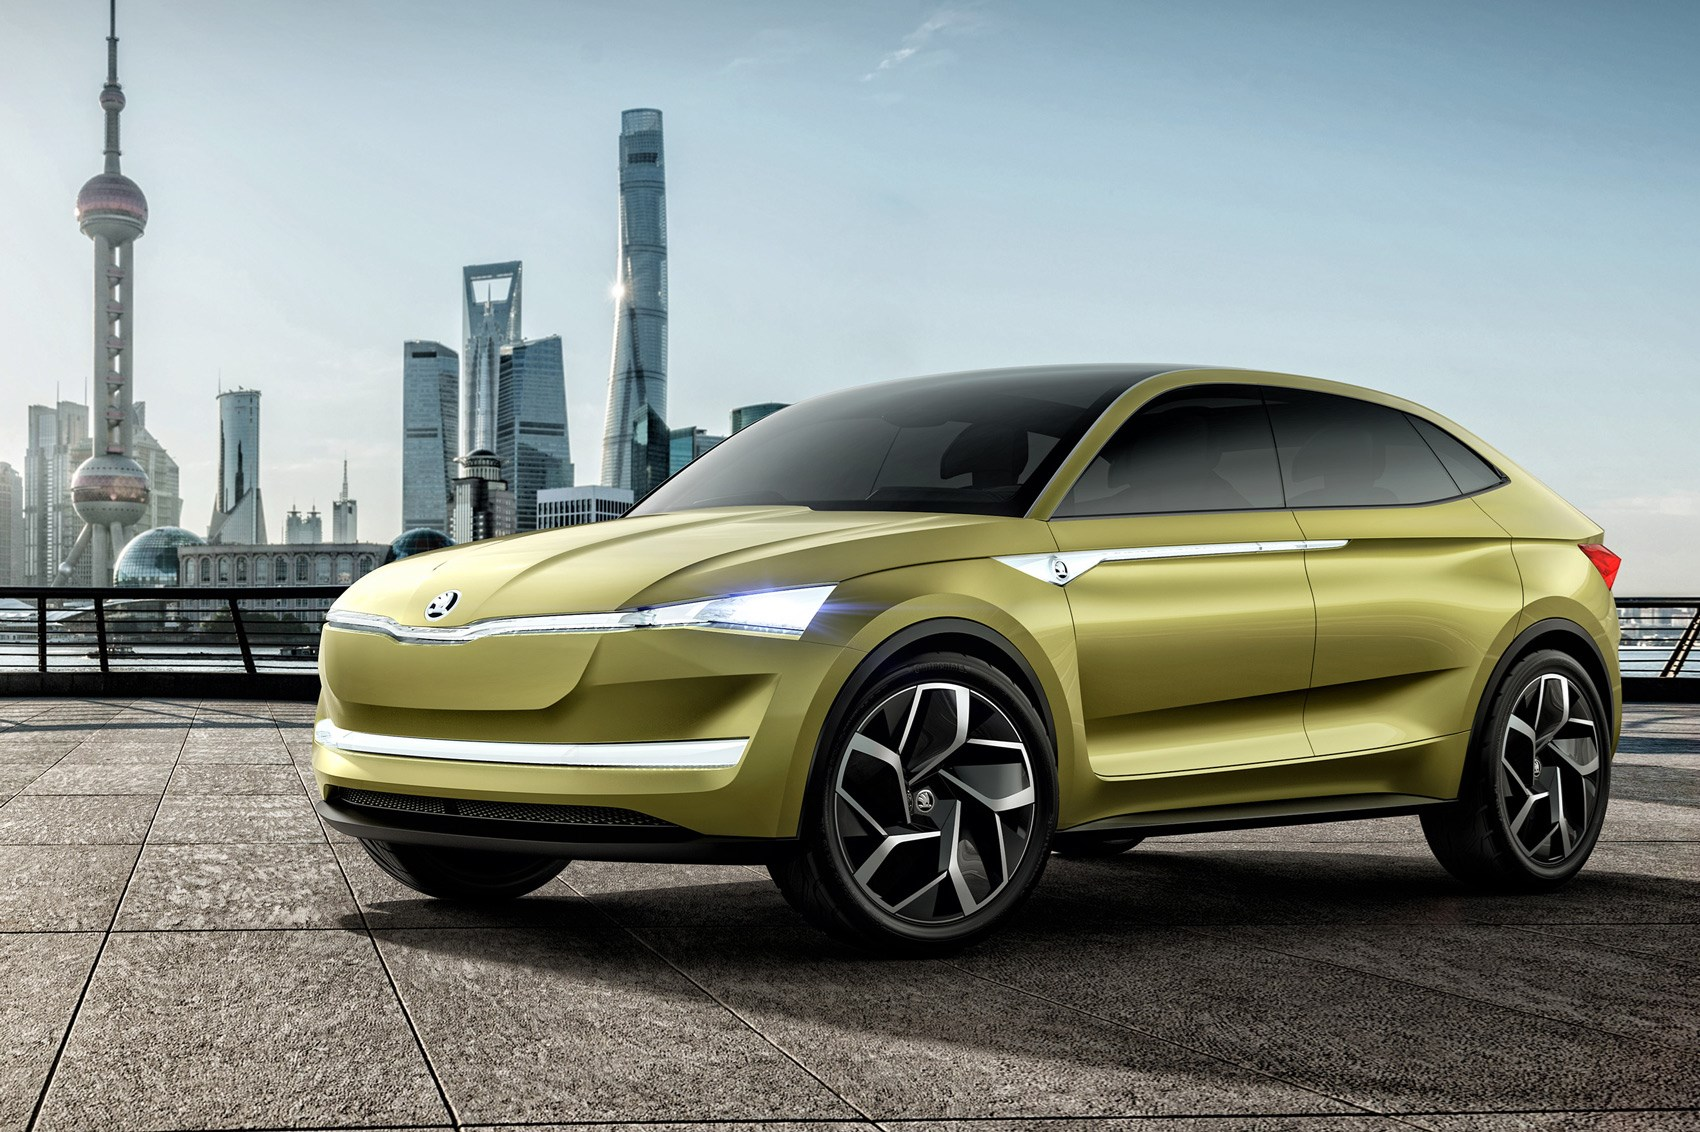 Skoda Vision E >> Skoda Vision E It S The Czechs First Electric Car Car Magazine